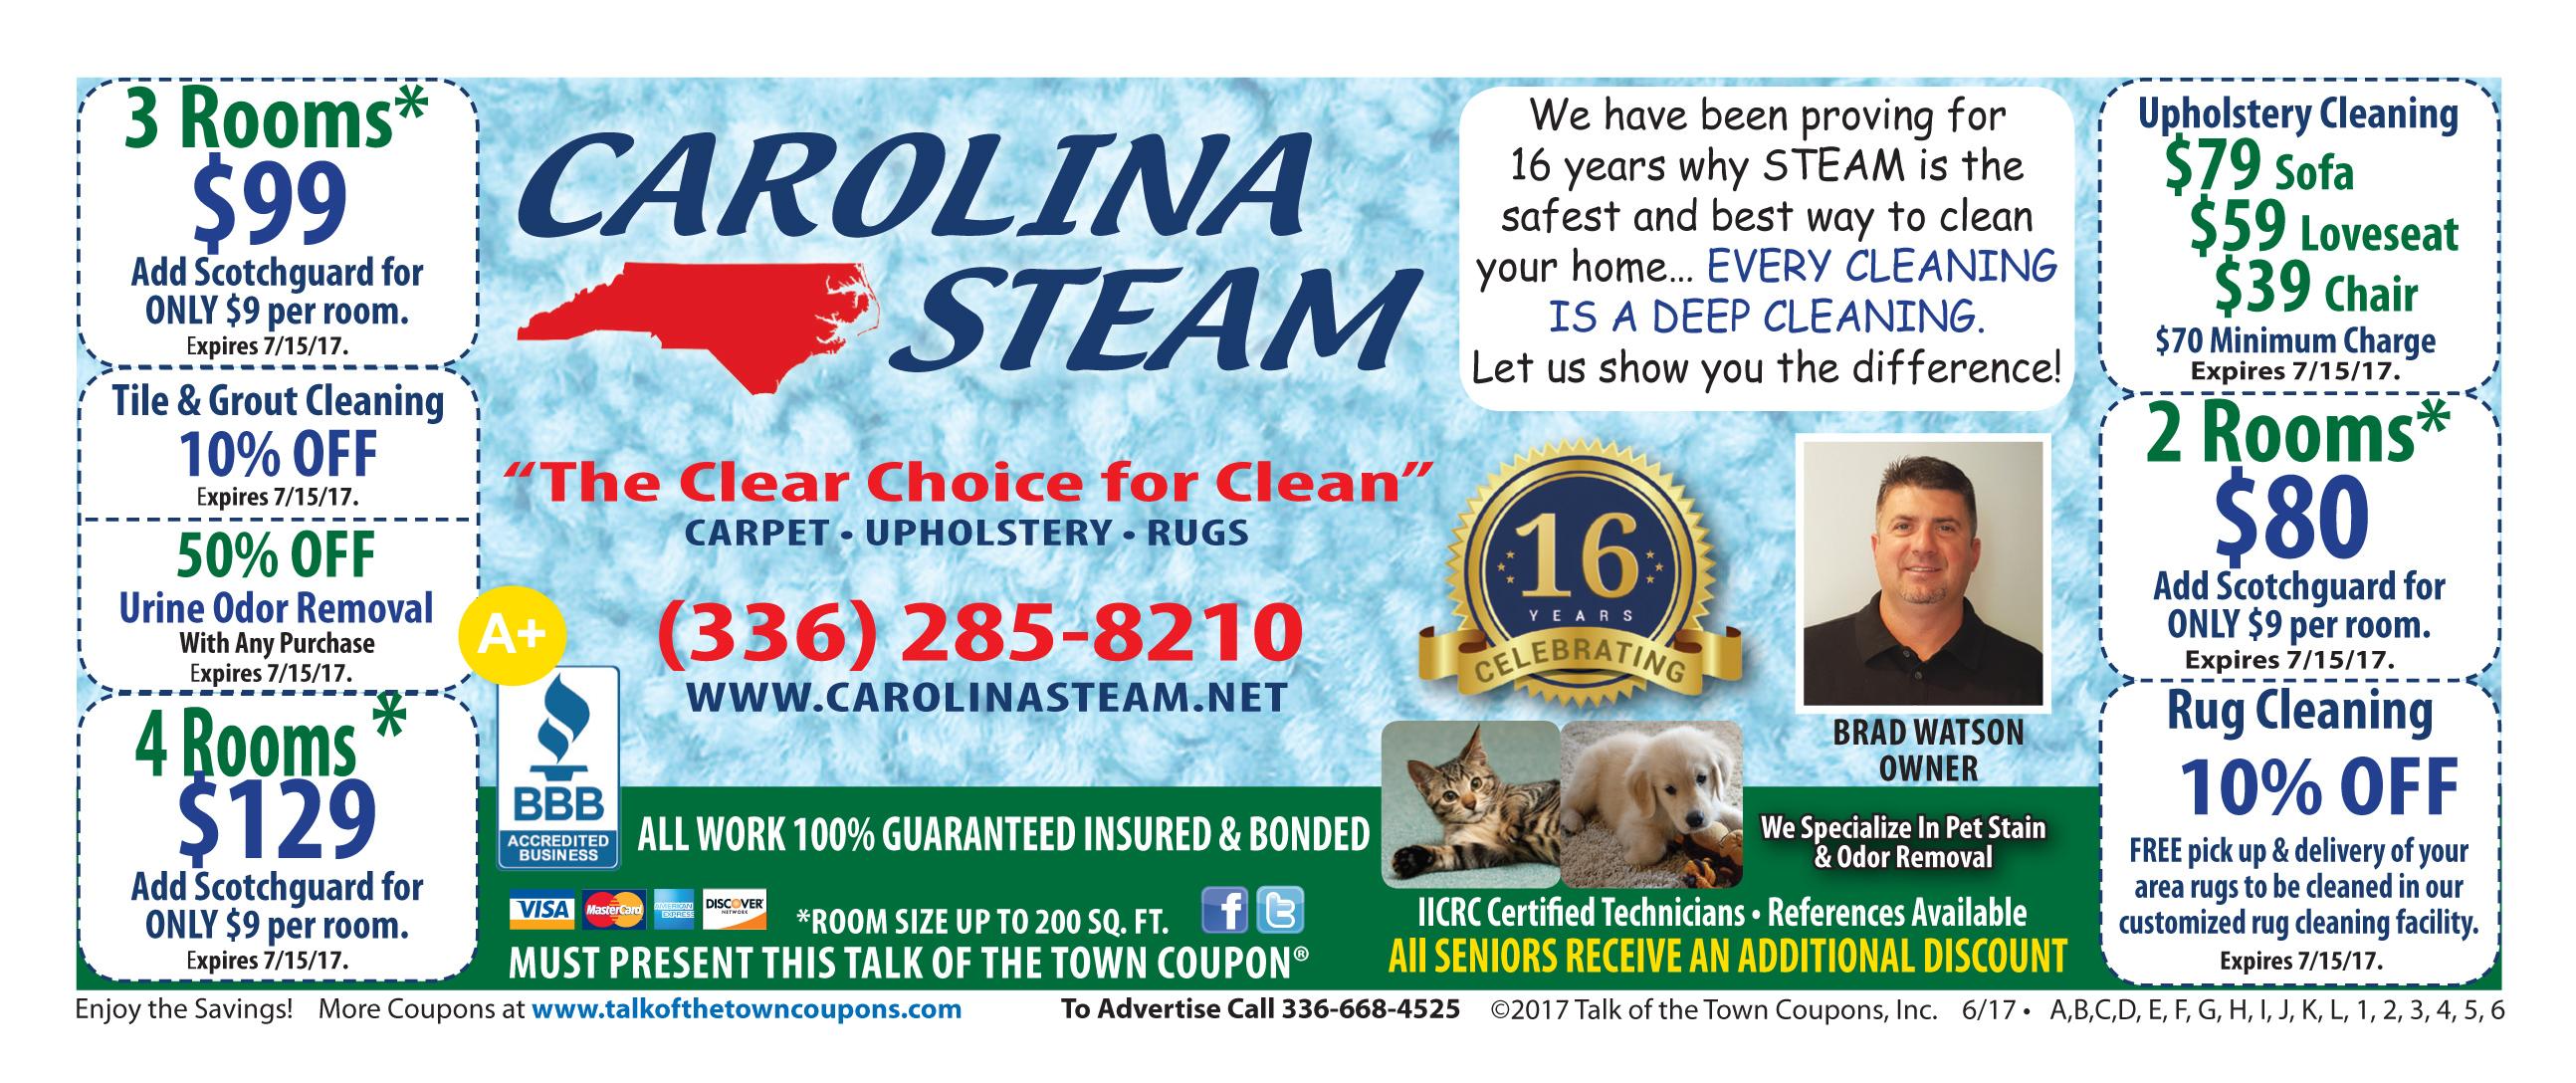 Carolina Steam Booklet Offer Coupon image